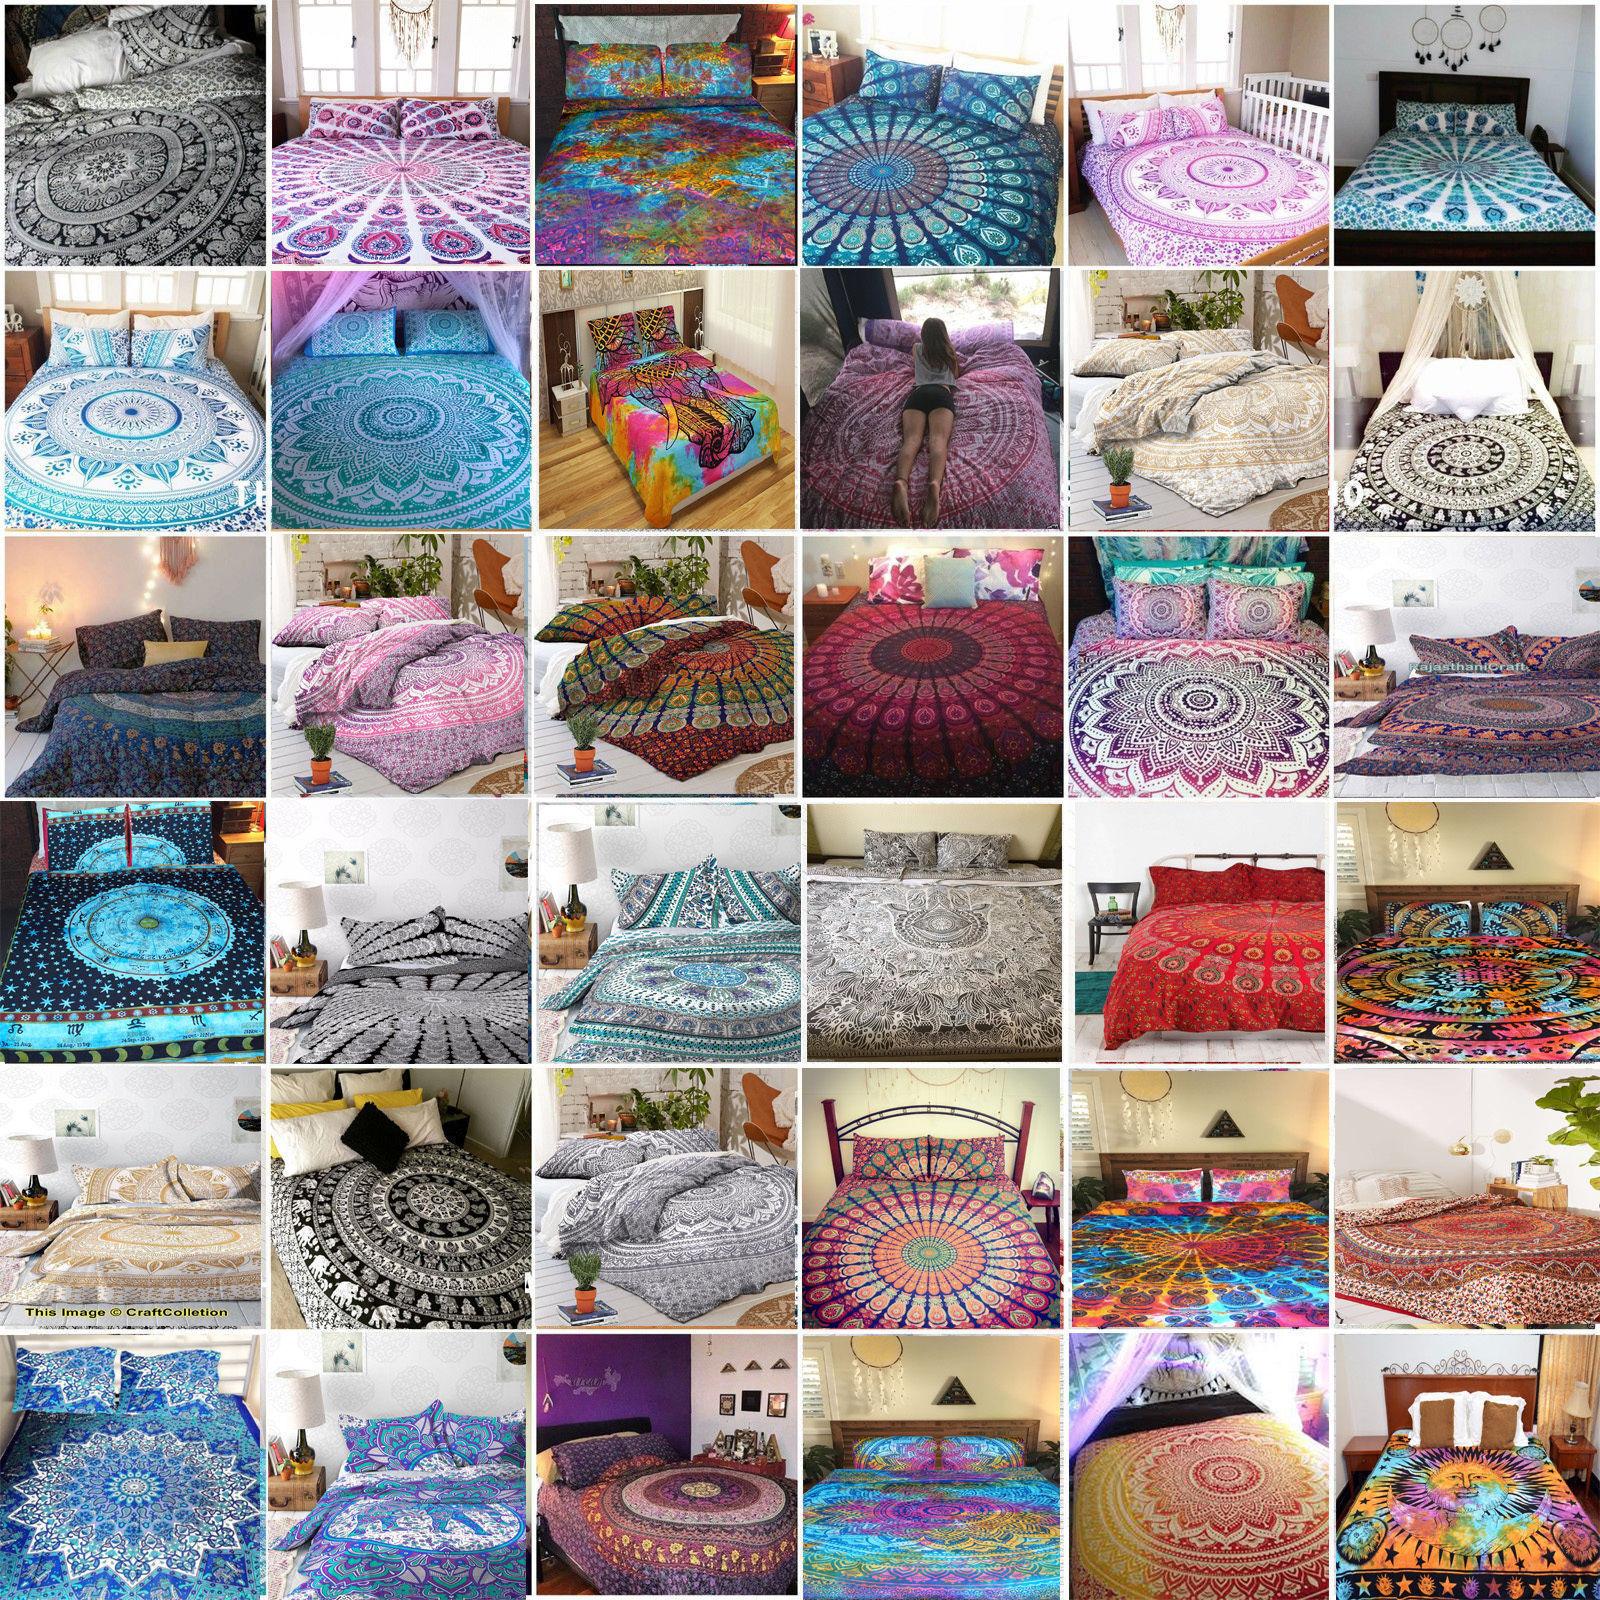 Indian mandala cotton duvet doona cover bohemian bedding blanket quilt cover set